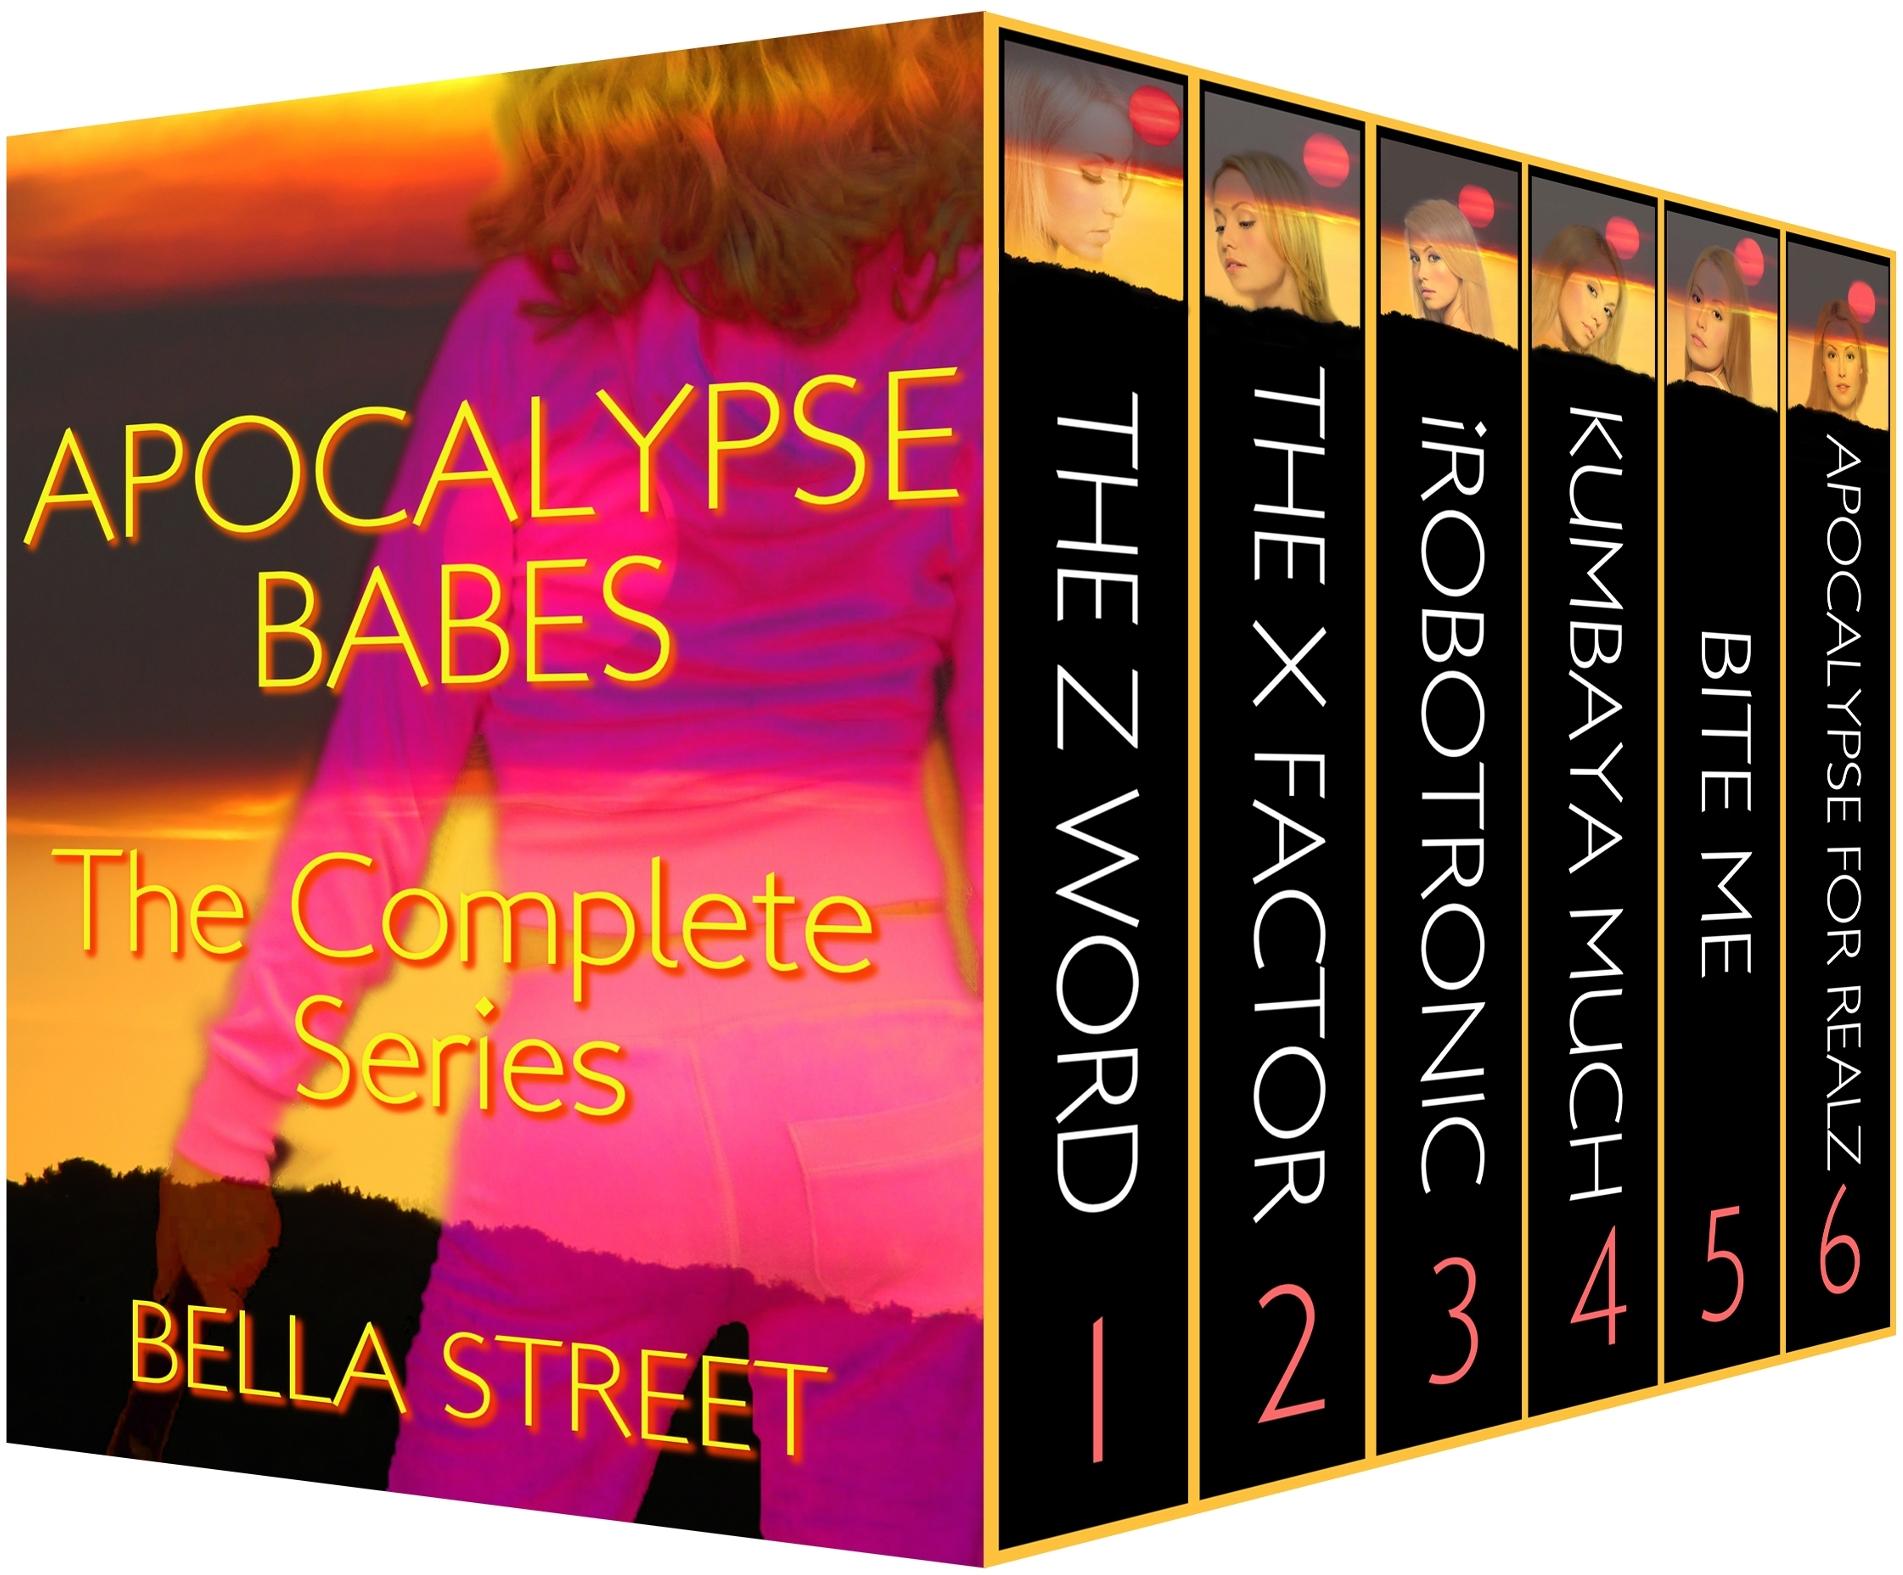 Apocalypse Babes: The Complete Series